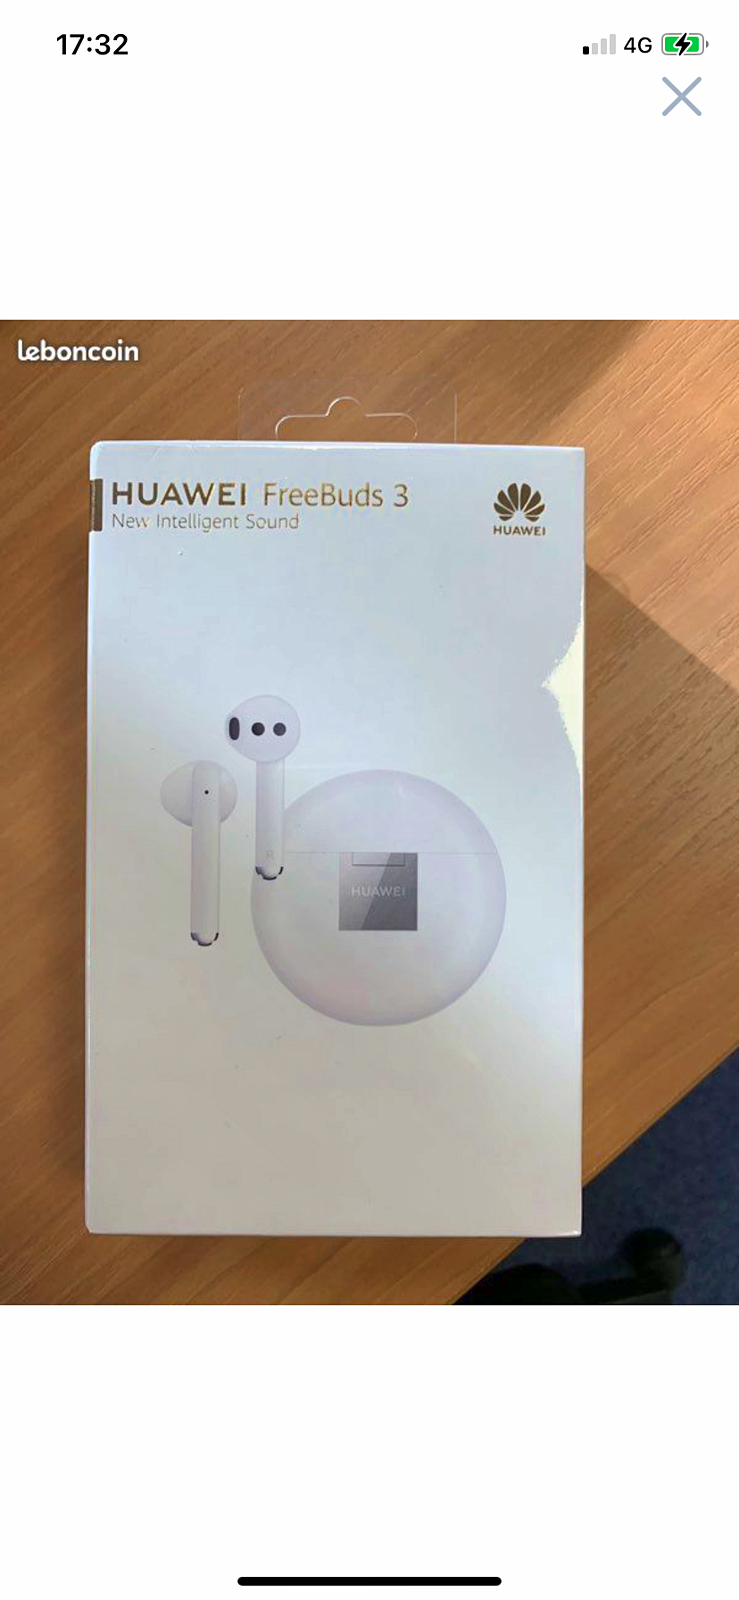 Écouteur freebuds 3sans fil Bluetooth Huawei